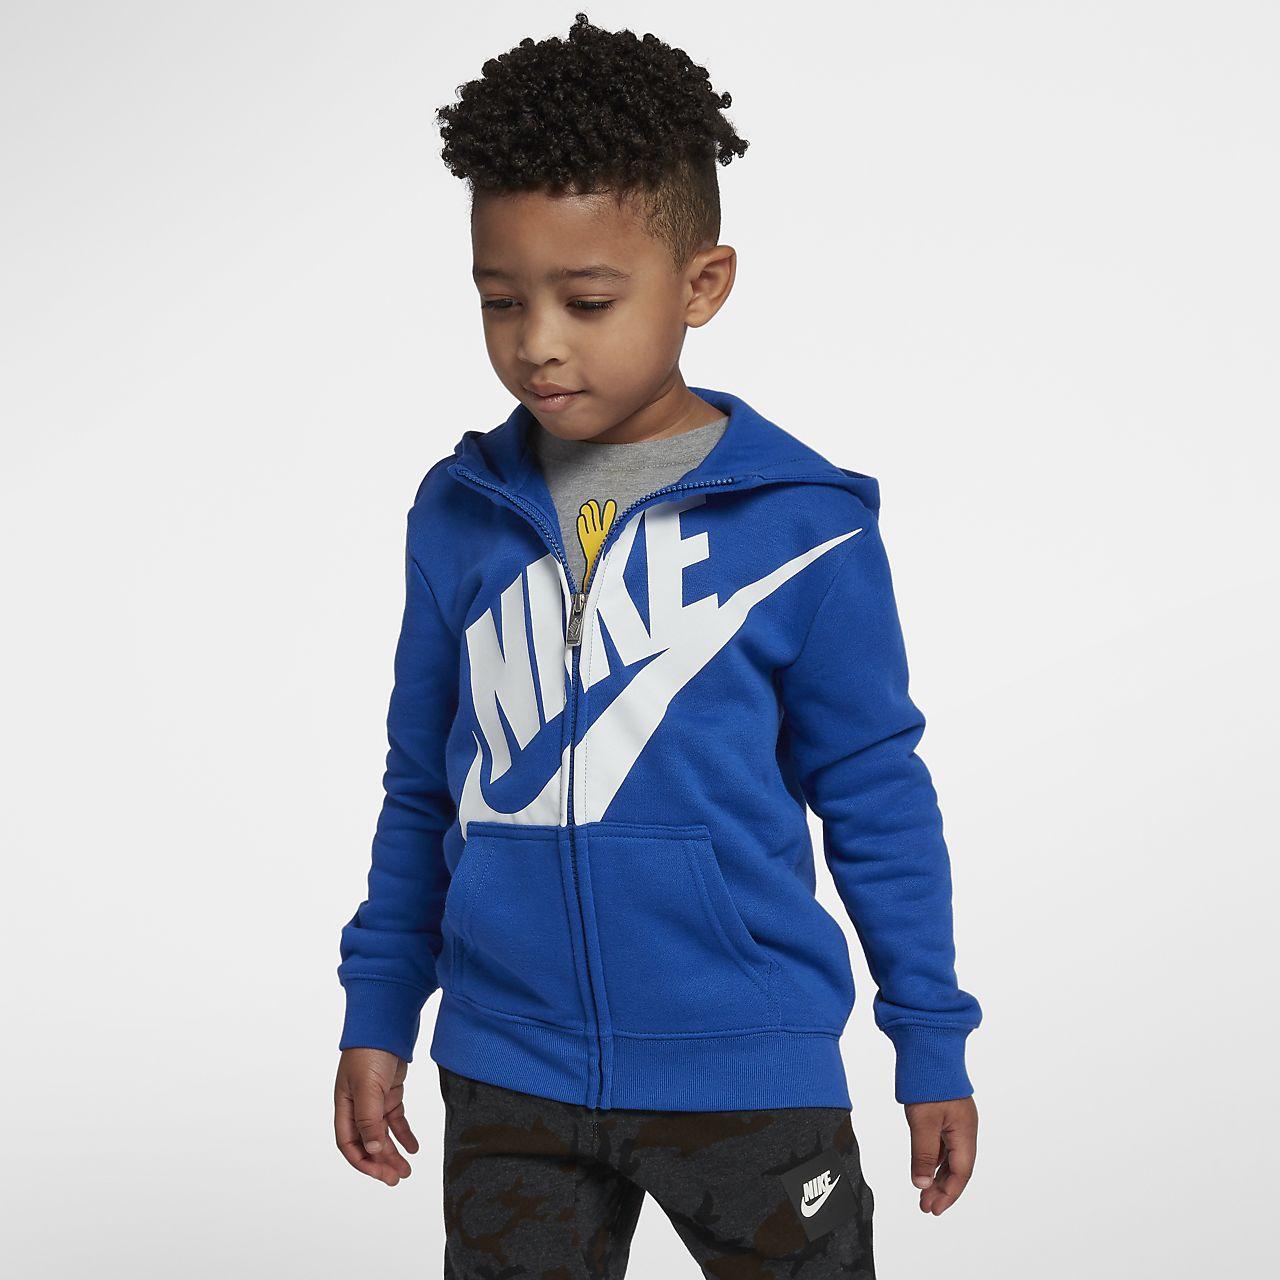 Nike Sudadera con capucha de tejido Fleece - Niño/a pequeño/a